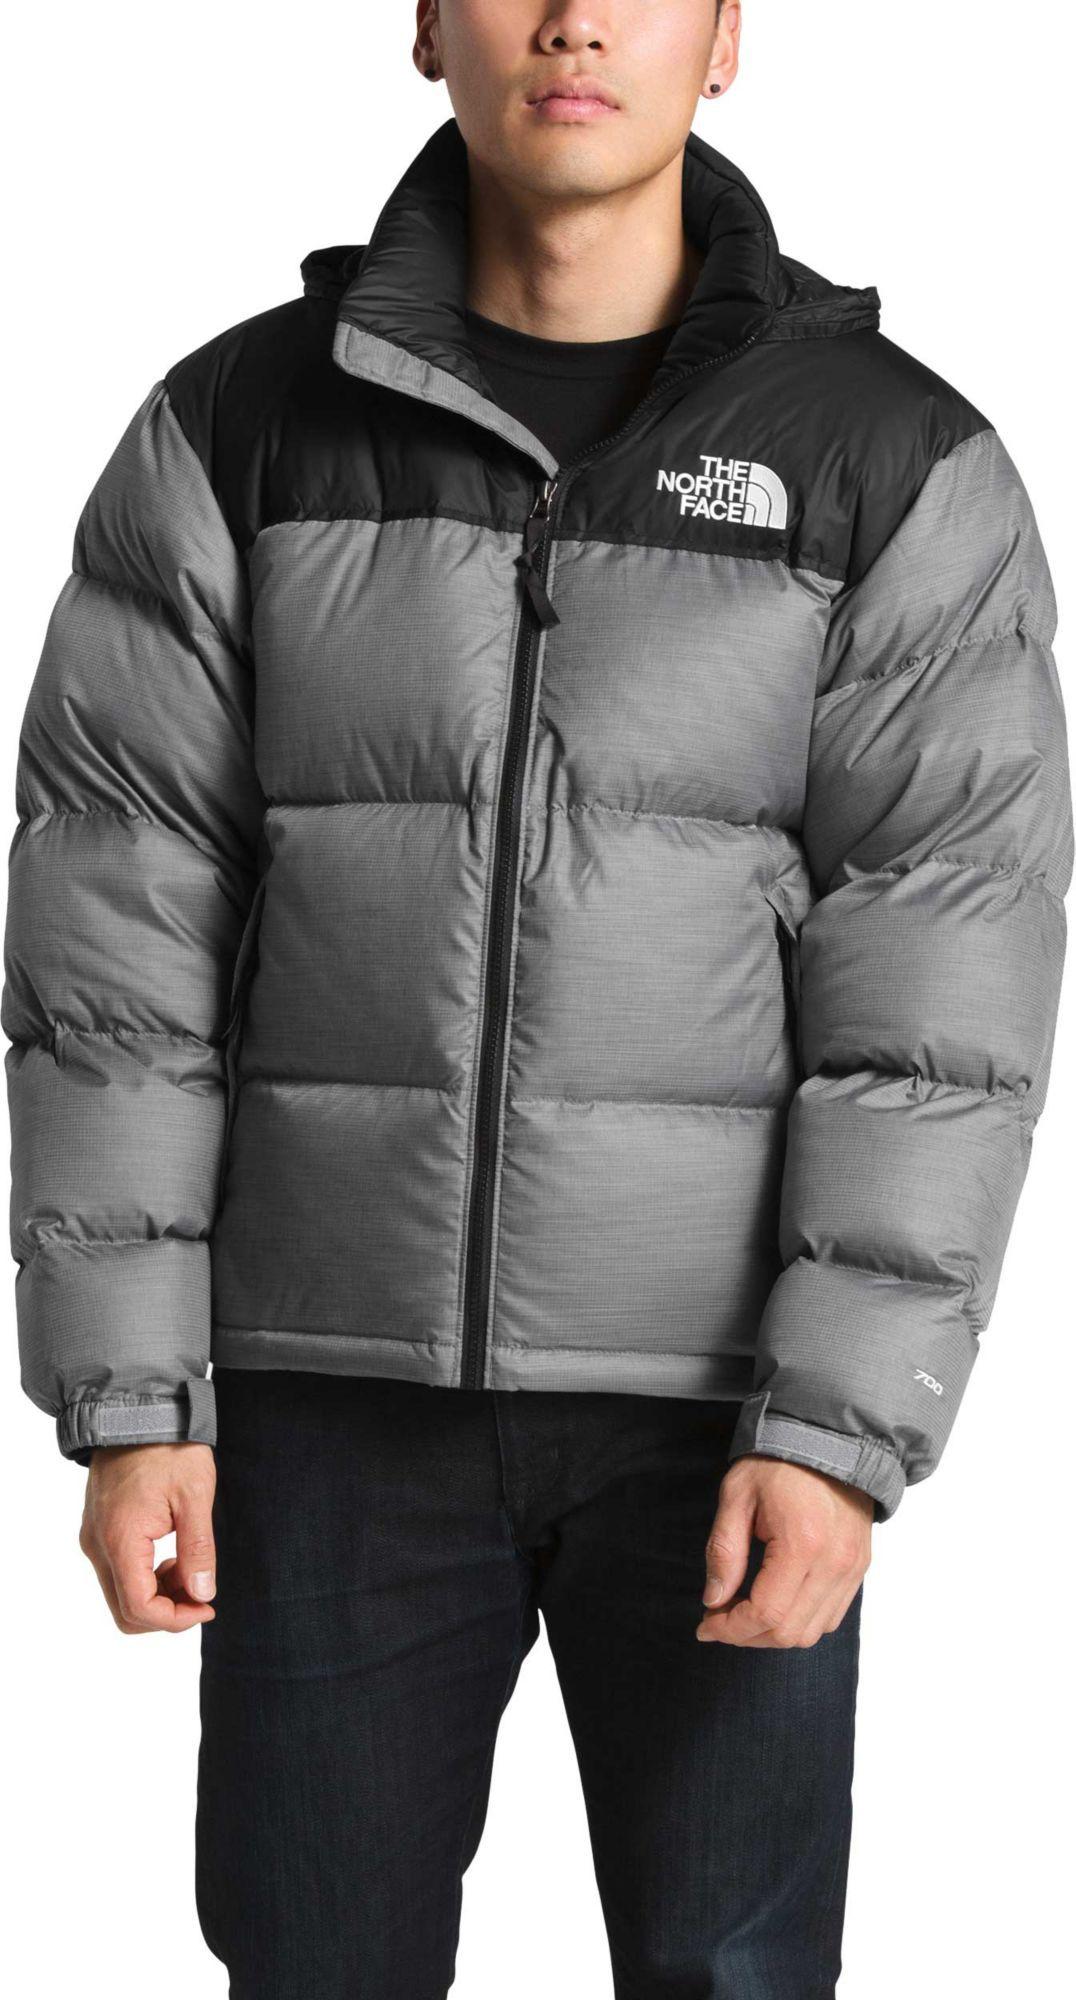 The North Face Men S 1996 Retro Nuptse Jacket Size Large Gray North Face Jacket Womens North Face Mens North Face Jacket